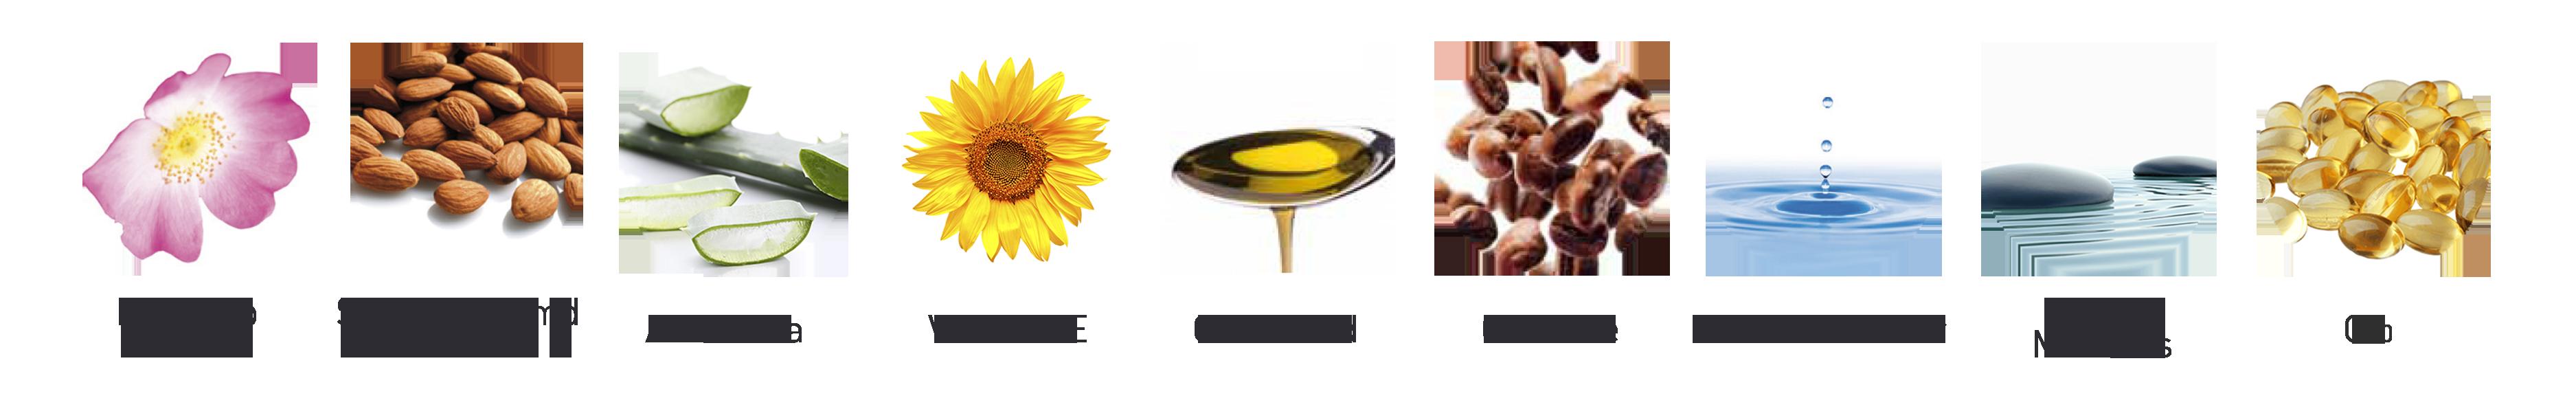 Novarel Cosmetotextile Ingredients